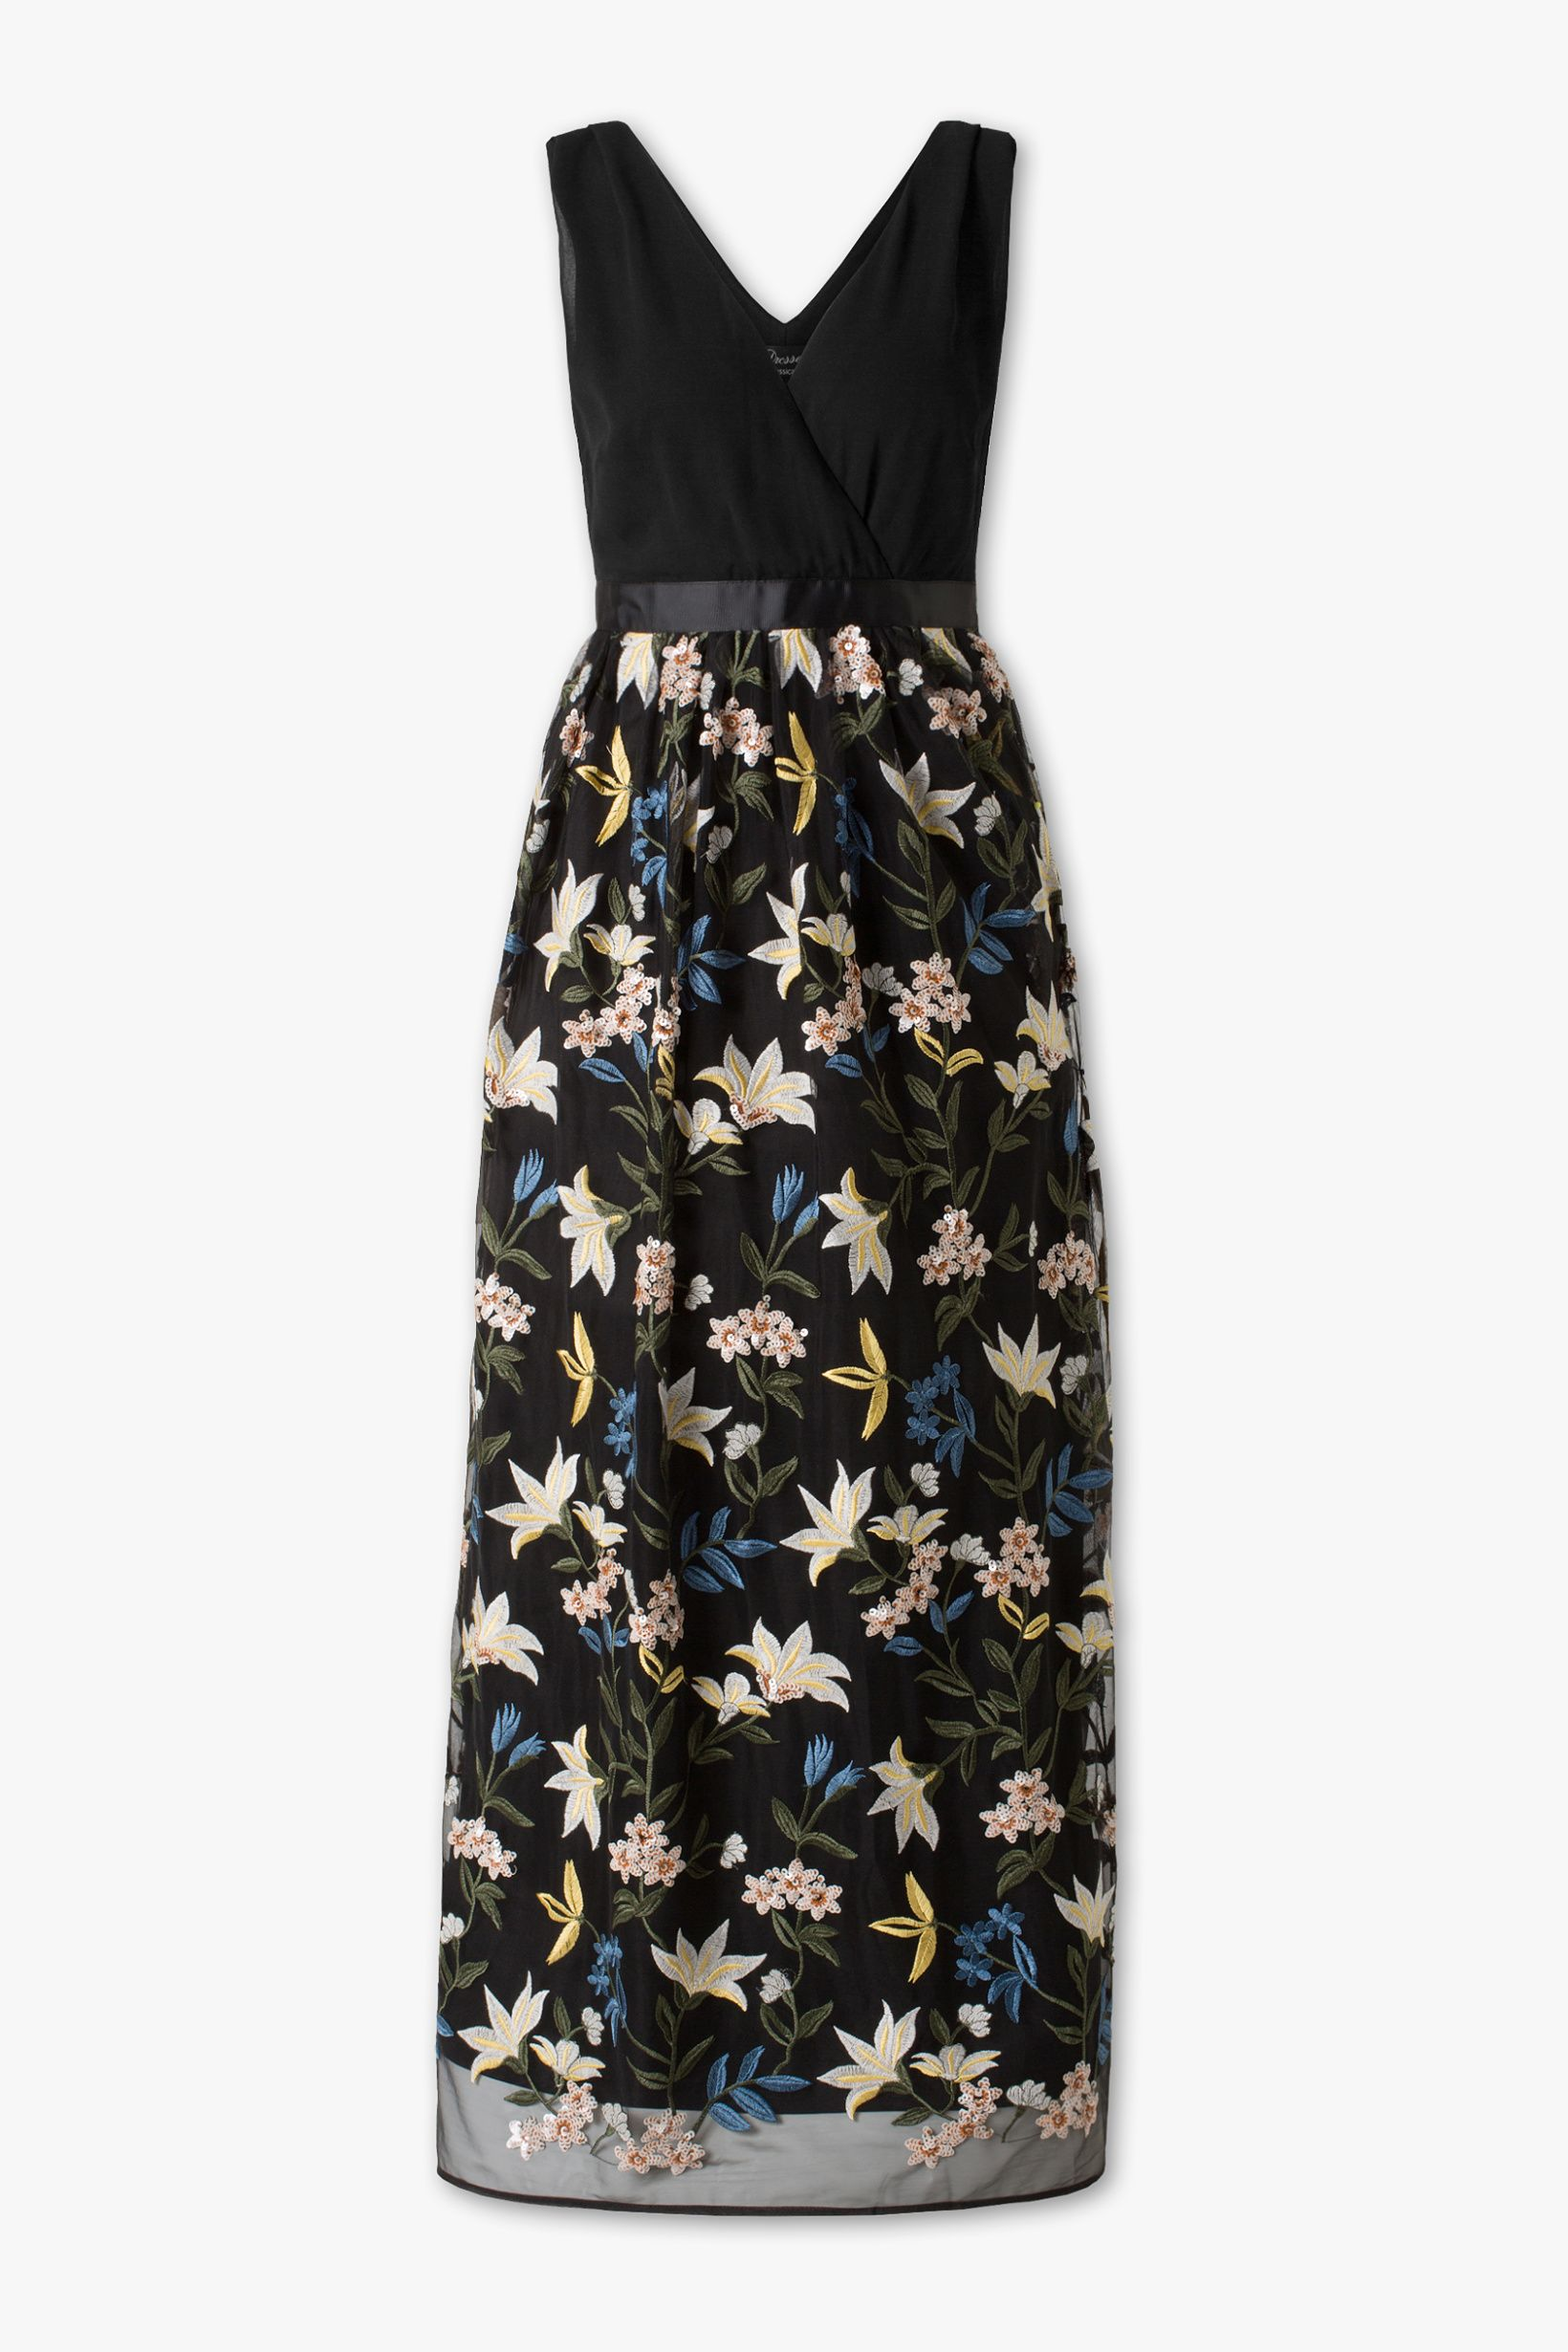 Fit Flare Dress Black Fit Flare Dress Dresses Fashion